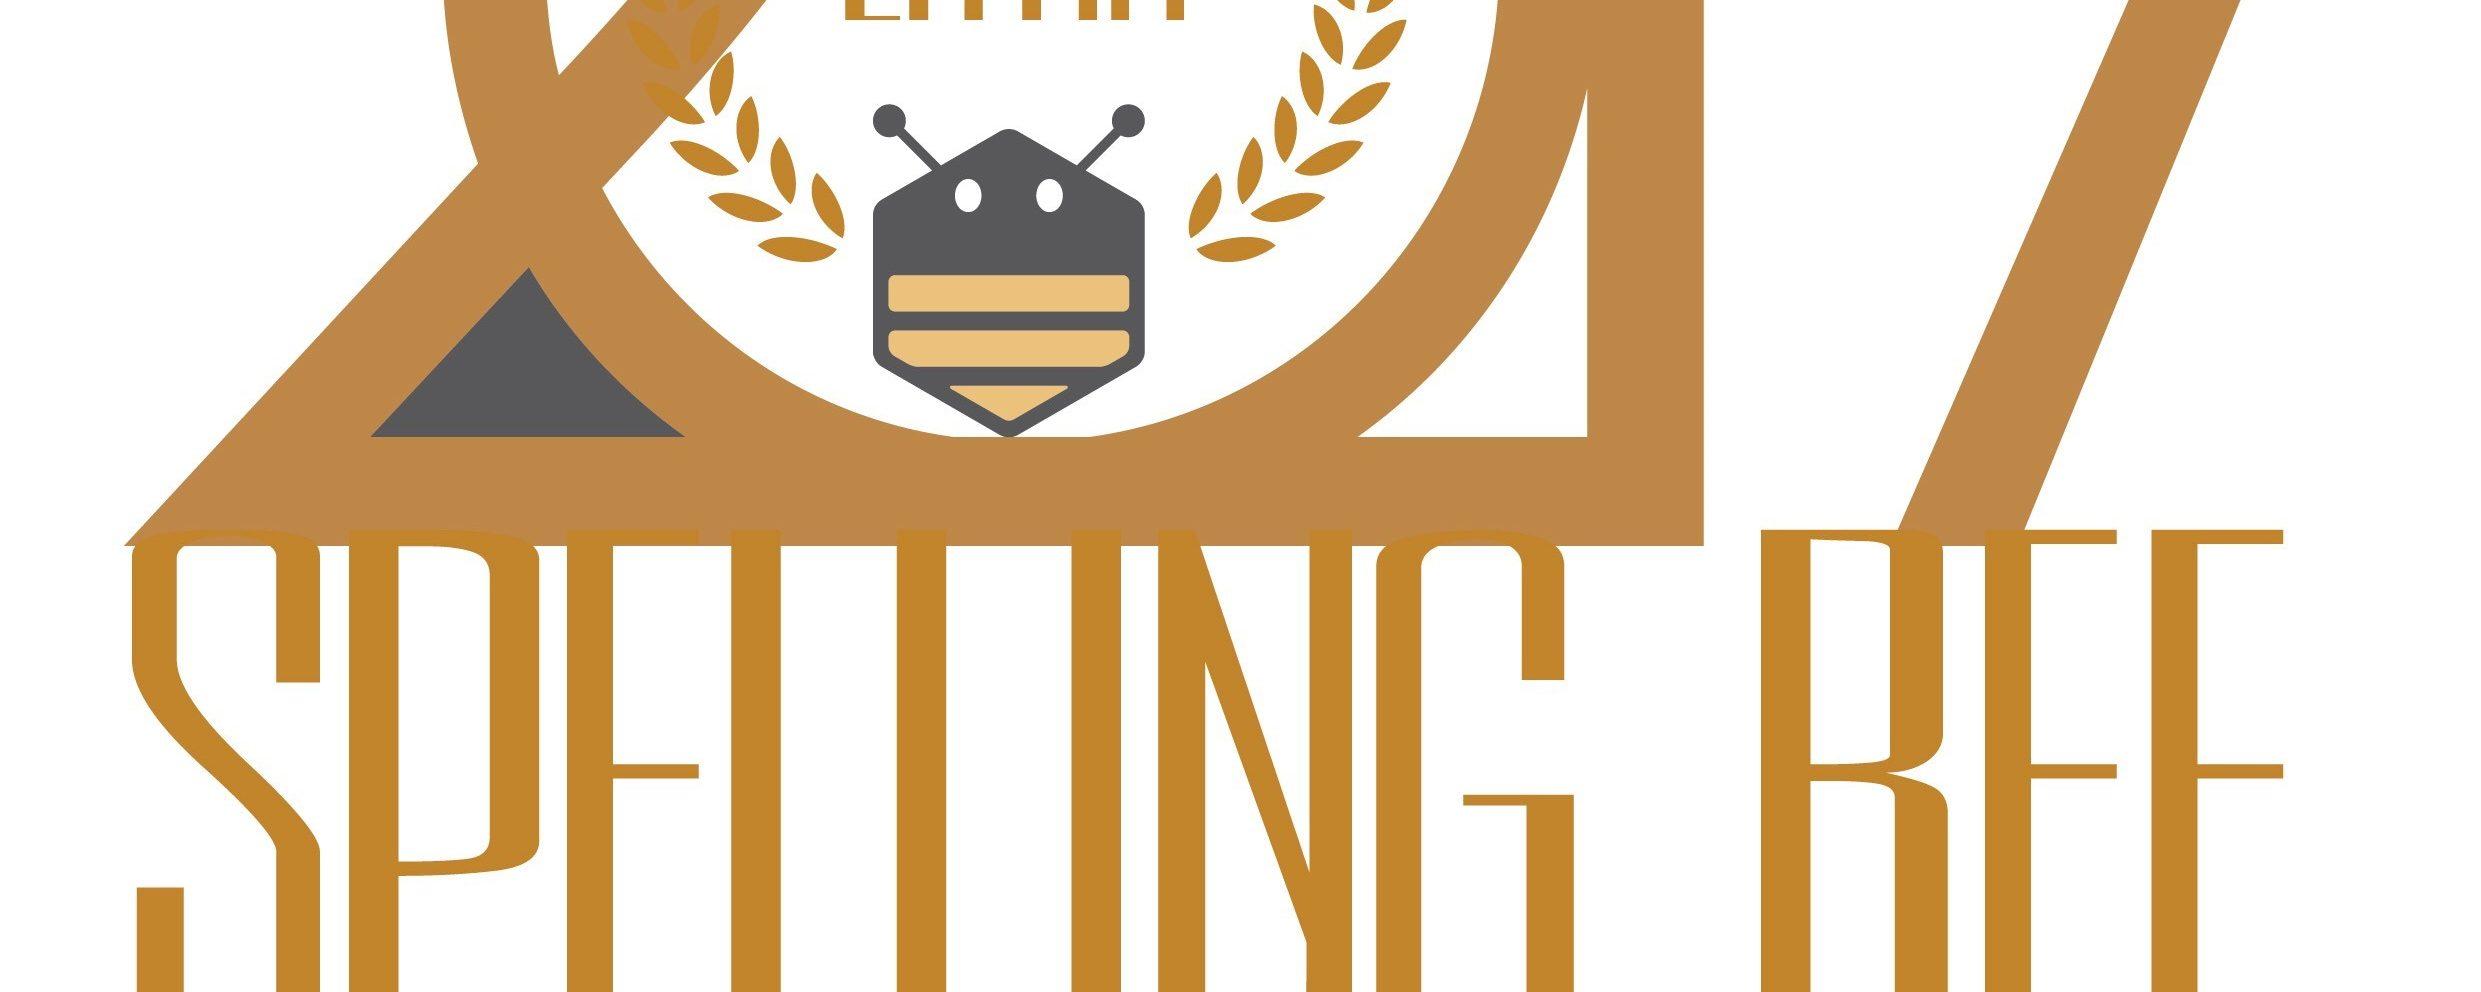 2019 Latin Spelling Bee